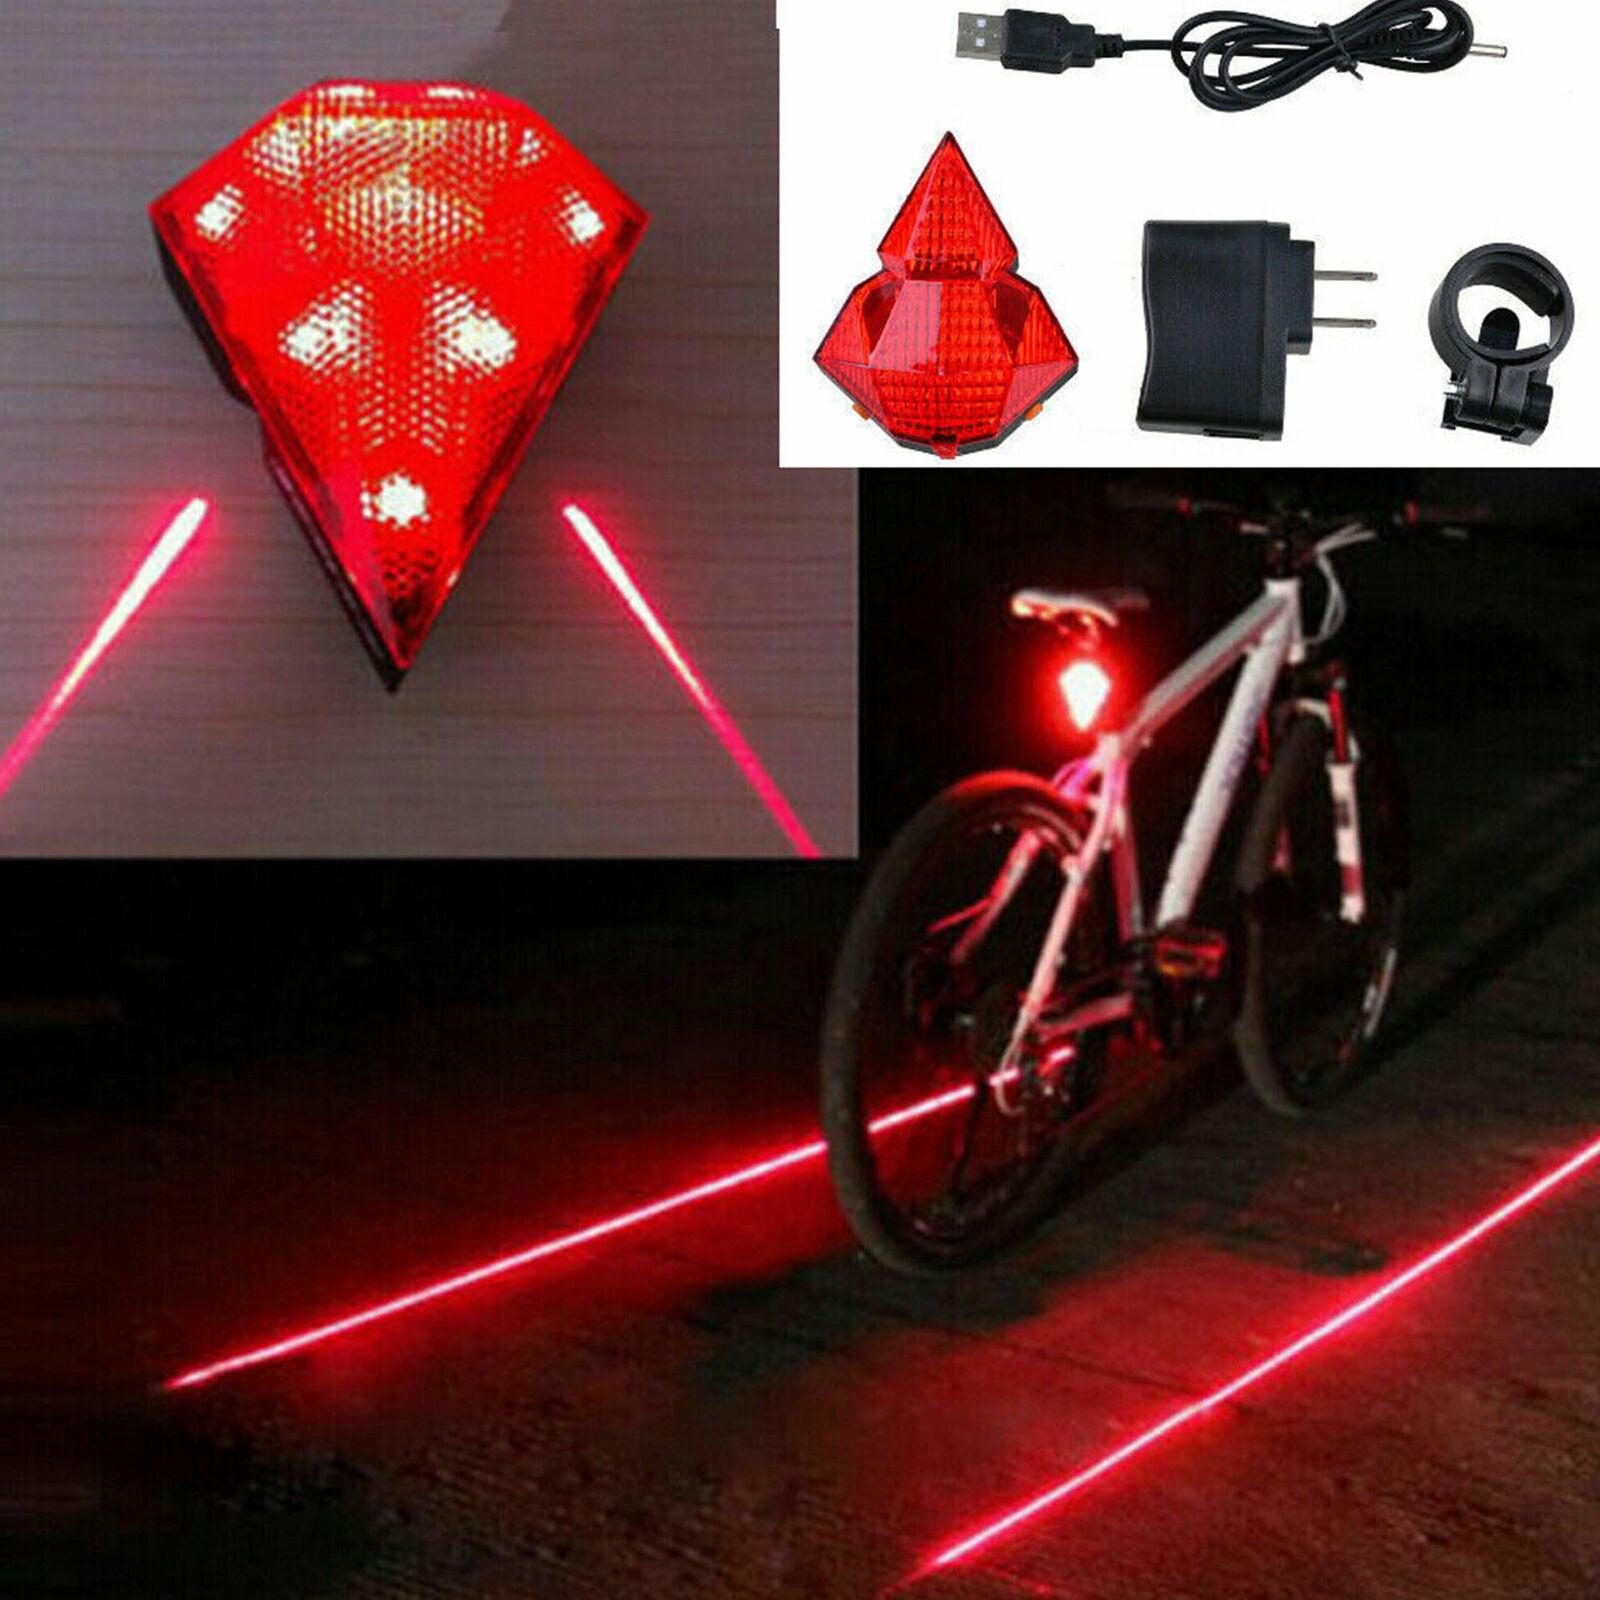 Turn Signal Bicycle Warning Light Safety Warning Lights Cycling Bike Handle Bar